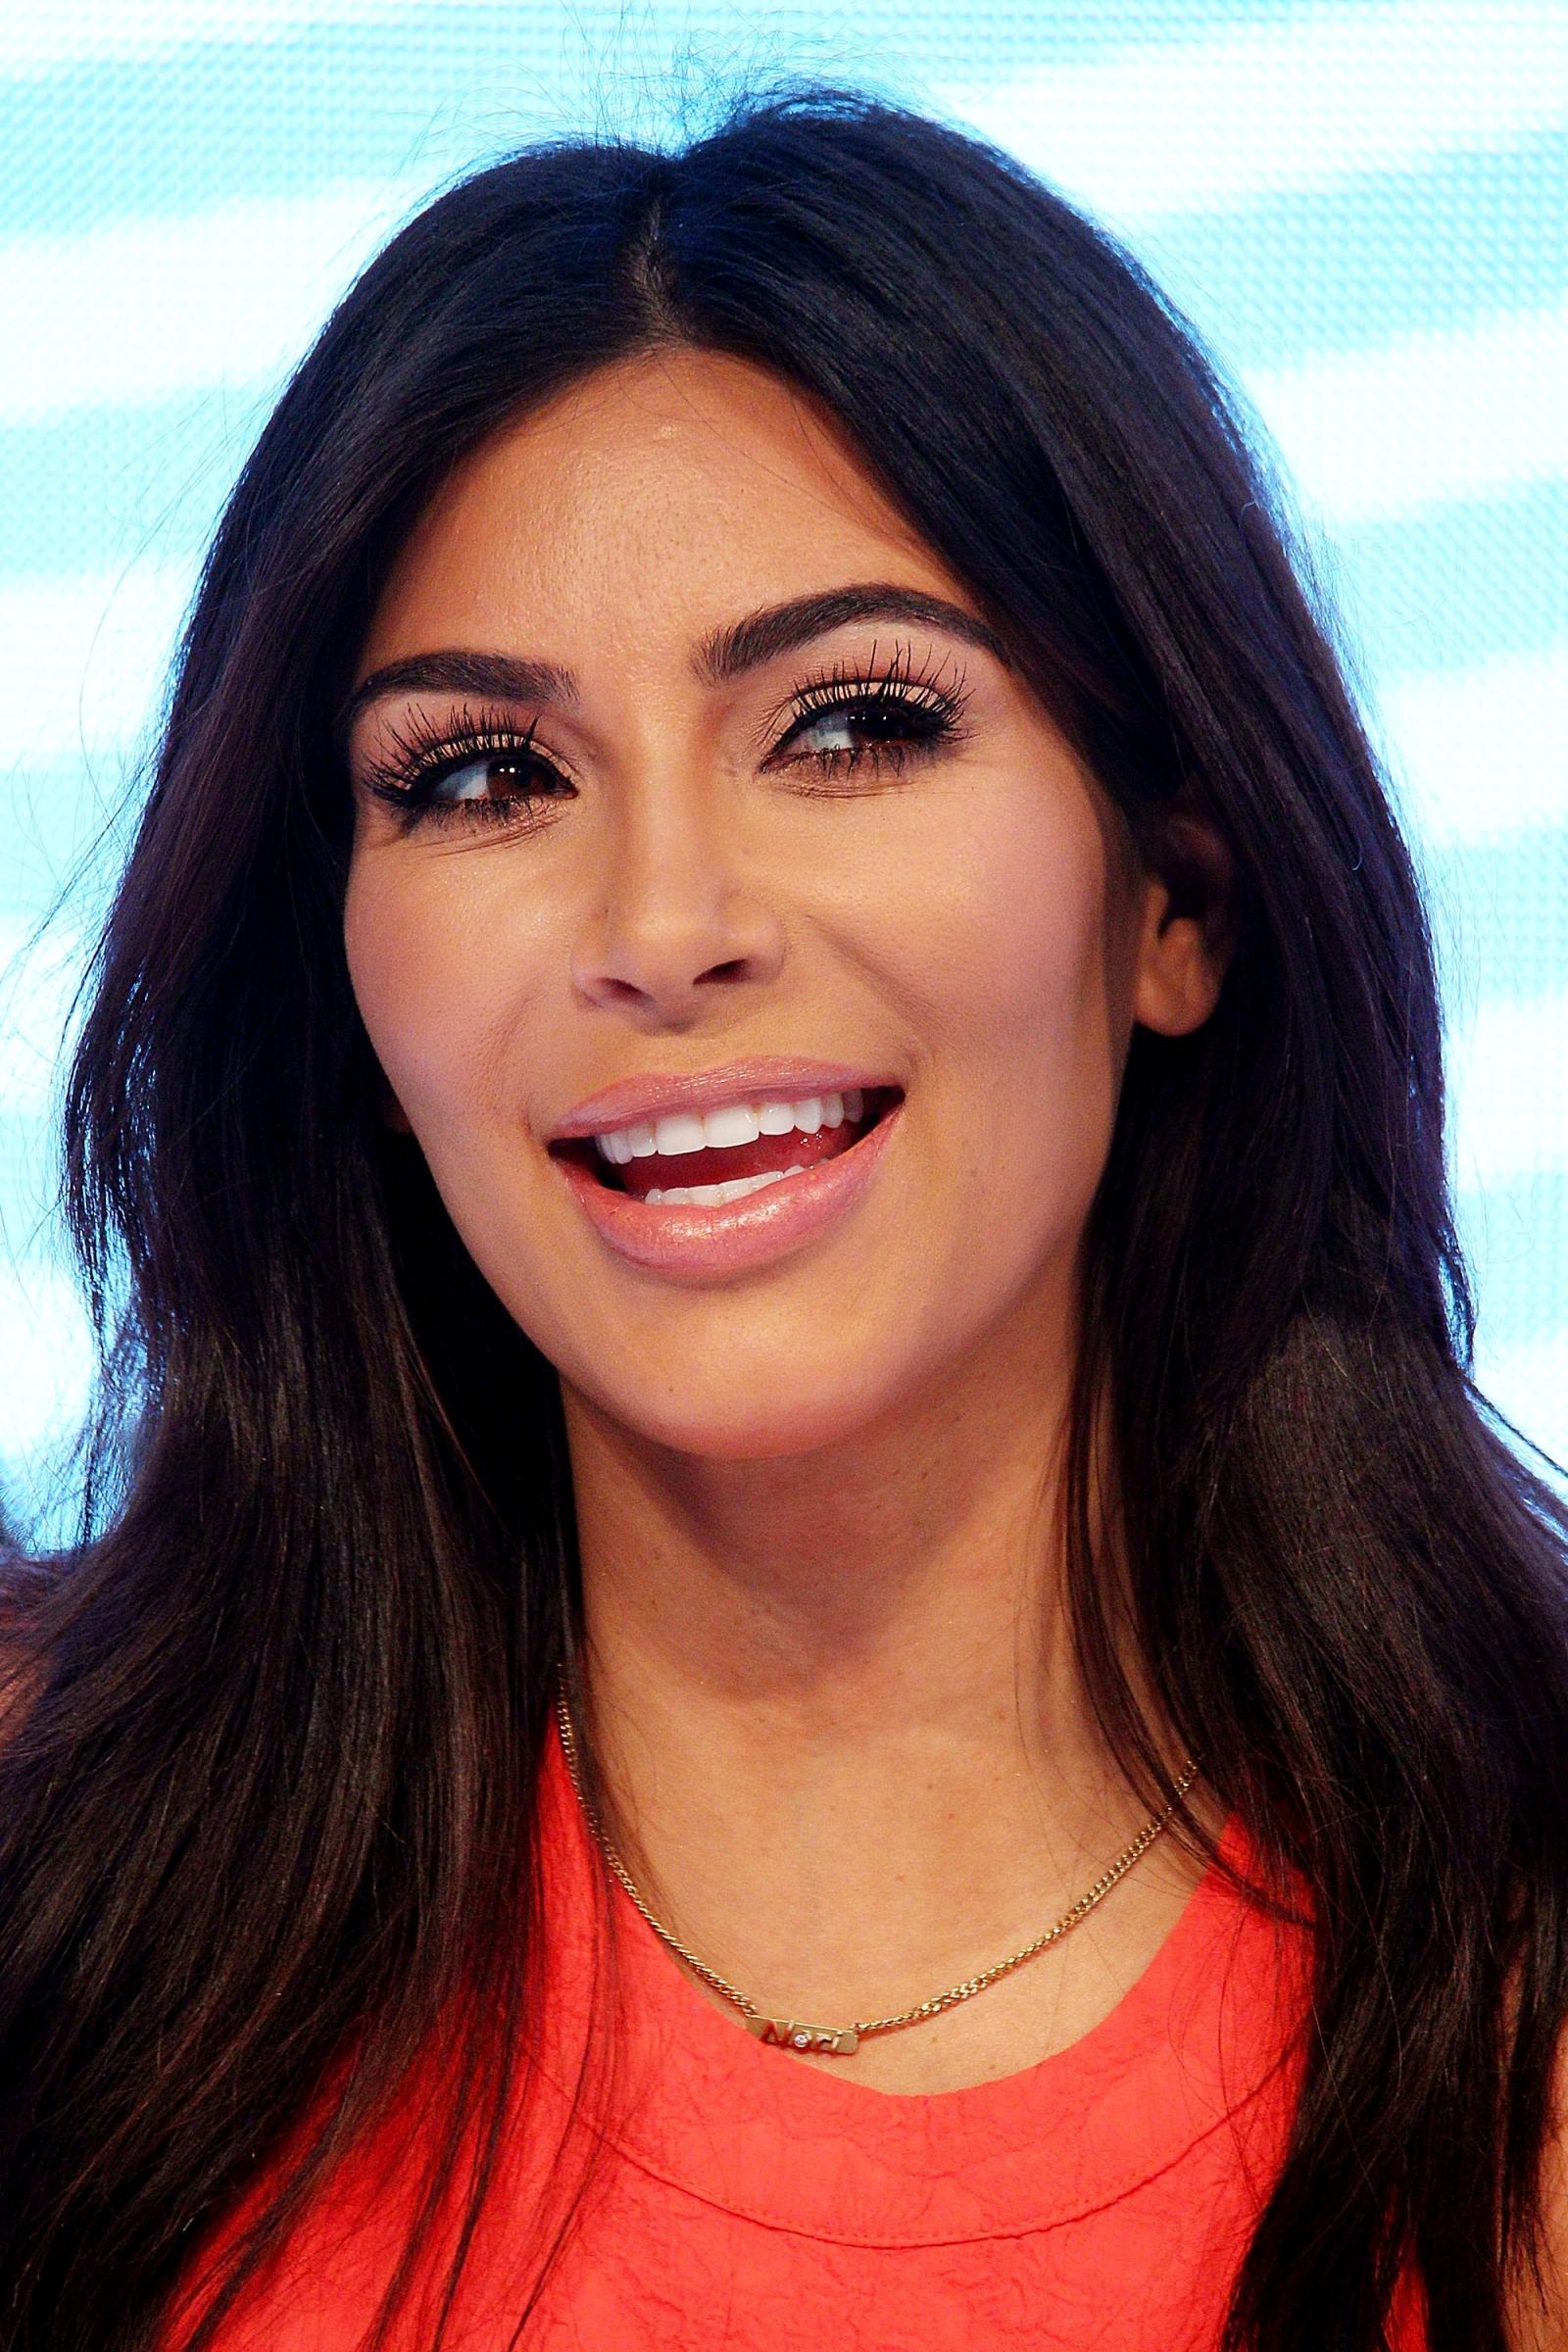 Kim Kardashian attends the Kardashian Kollection Spring Launch at Westfield Parramatta in Australia